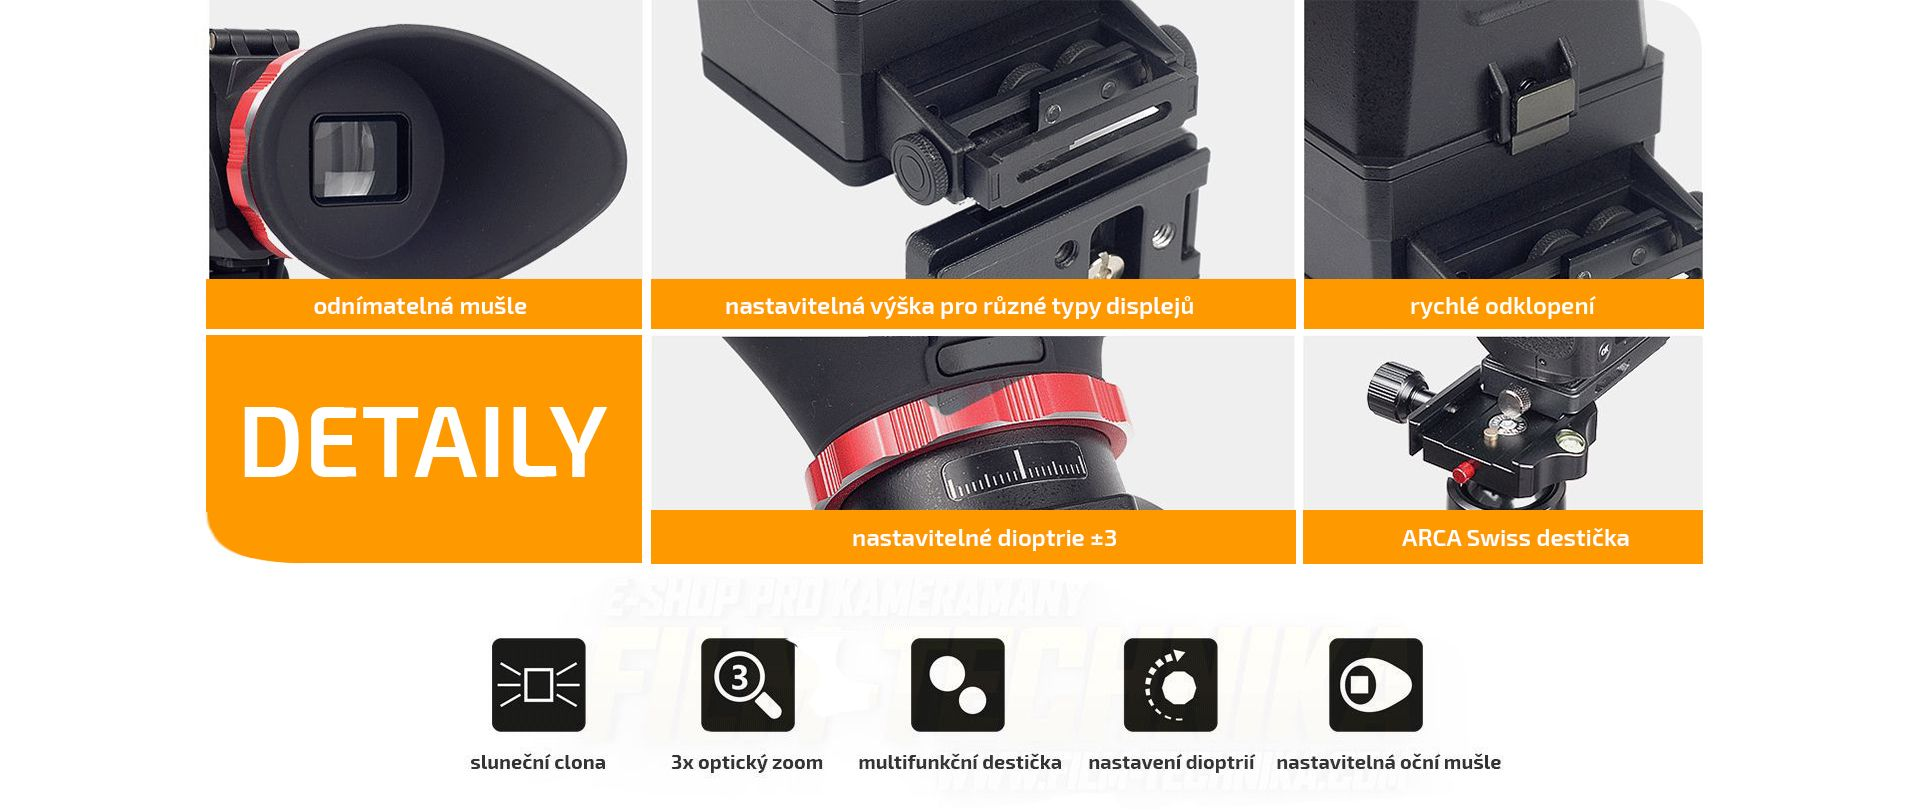 film-technika-ggs-s6-intext4